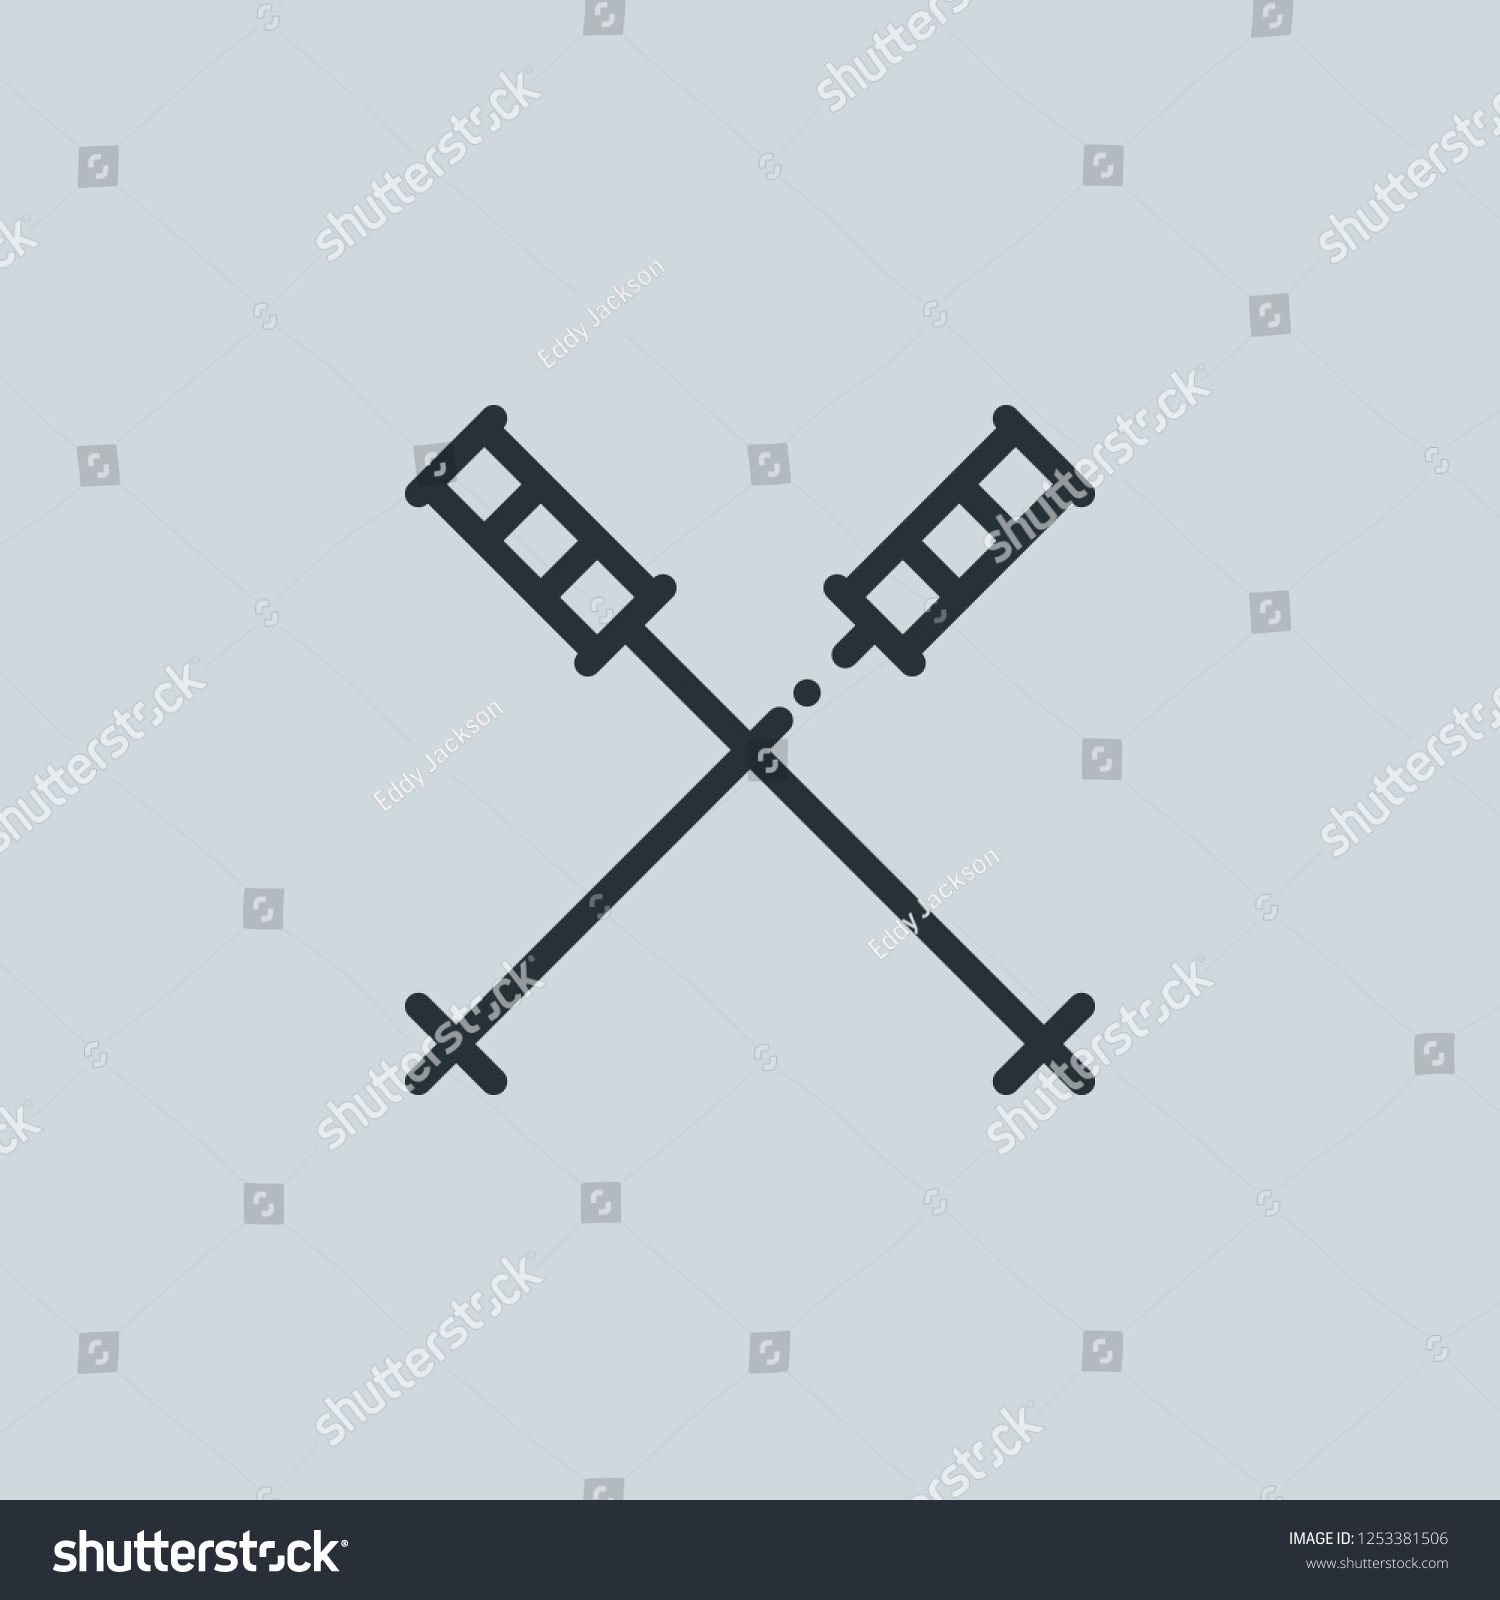 Outline Ski Vector Icon Ski Illustration For Web Mobile Apps Design Ski Vector Symbol Ad Ad Icon Sk Abstract Design Royalty Free Photos Illustration